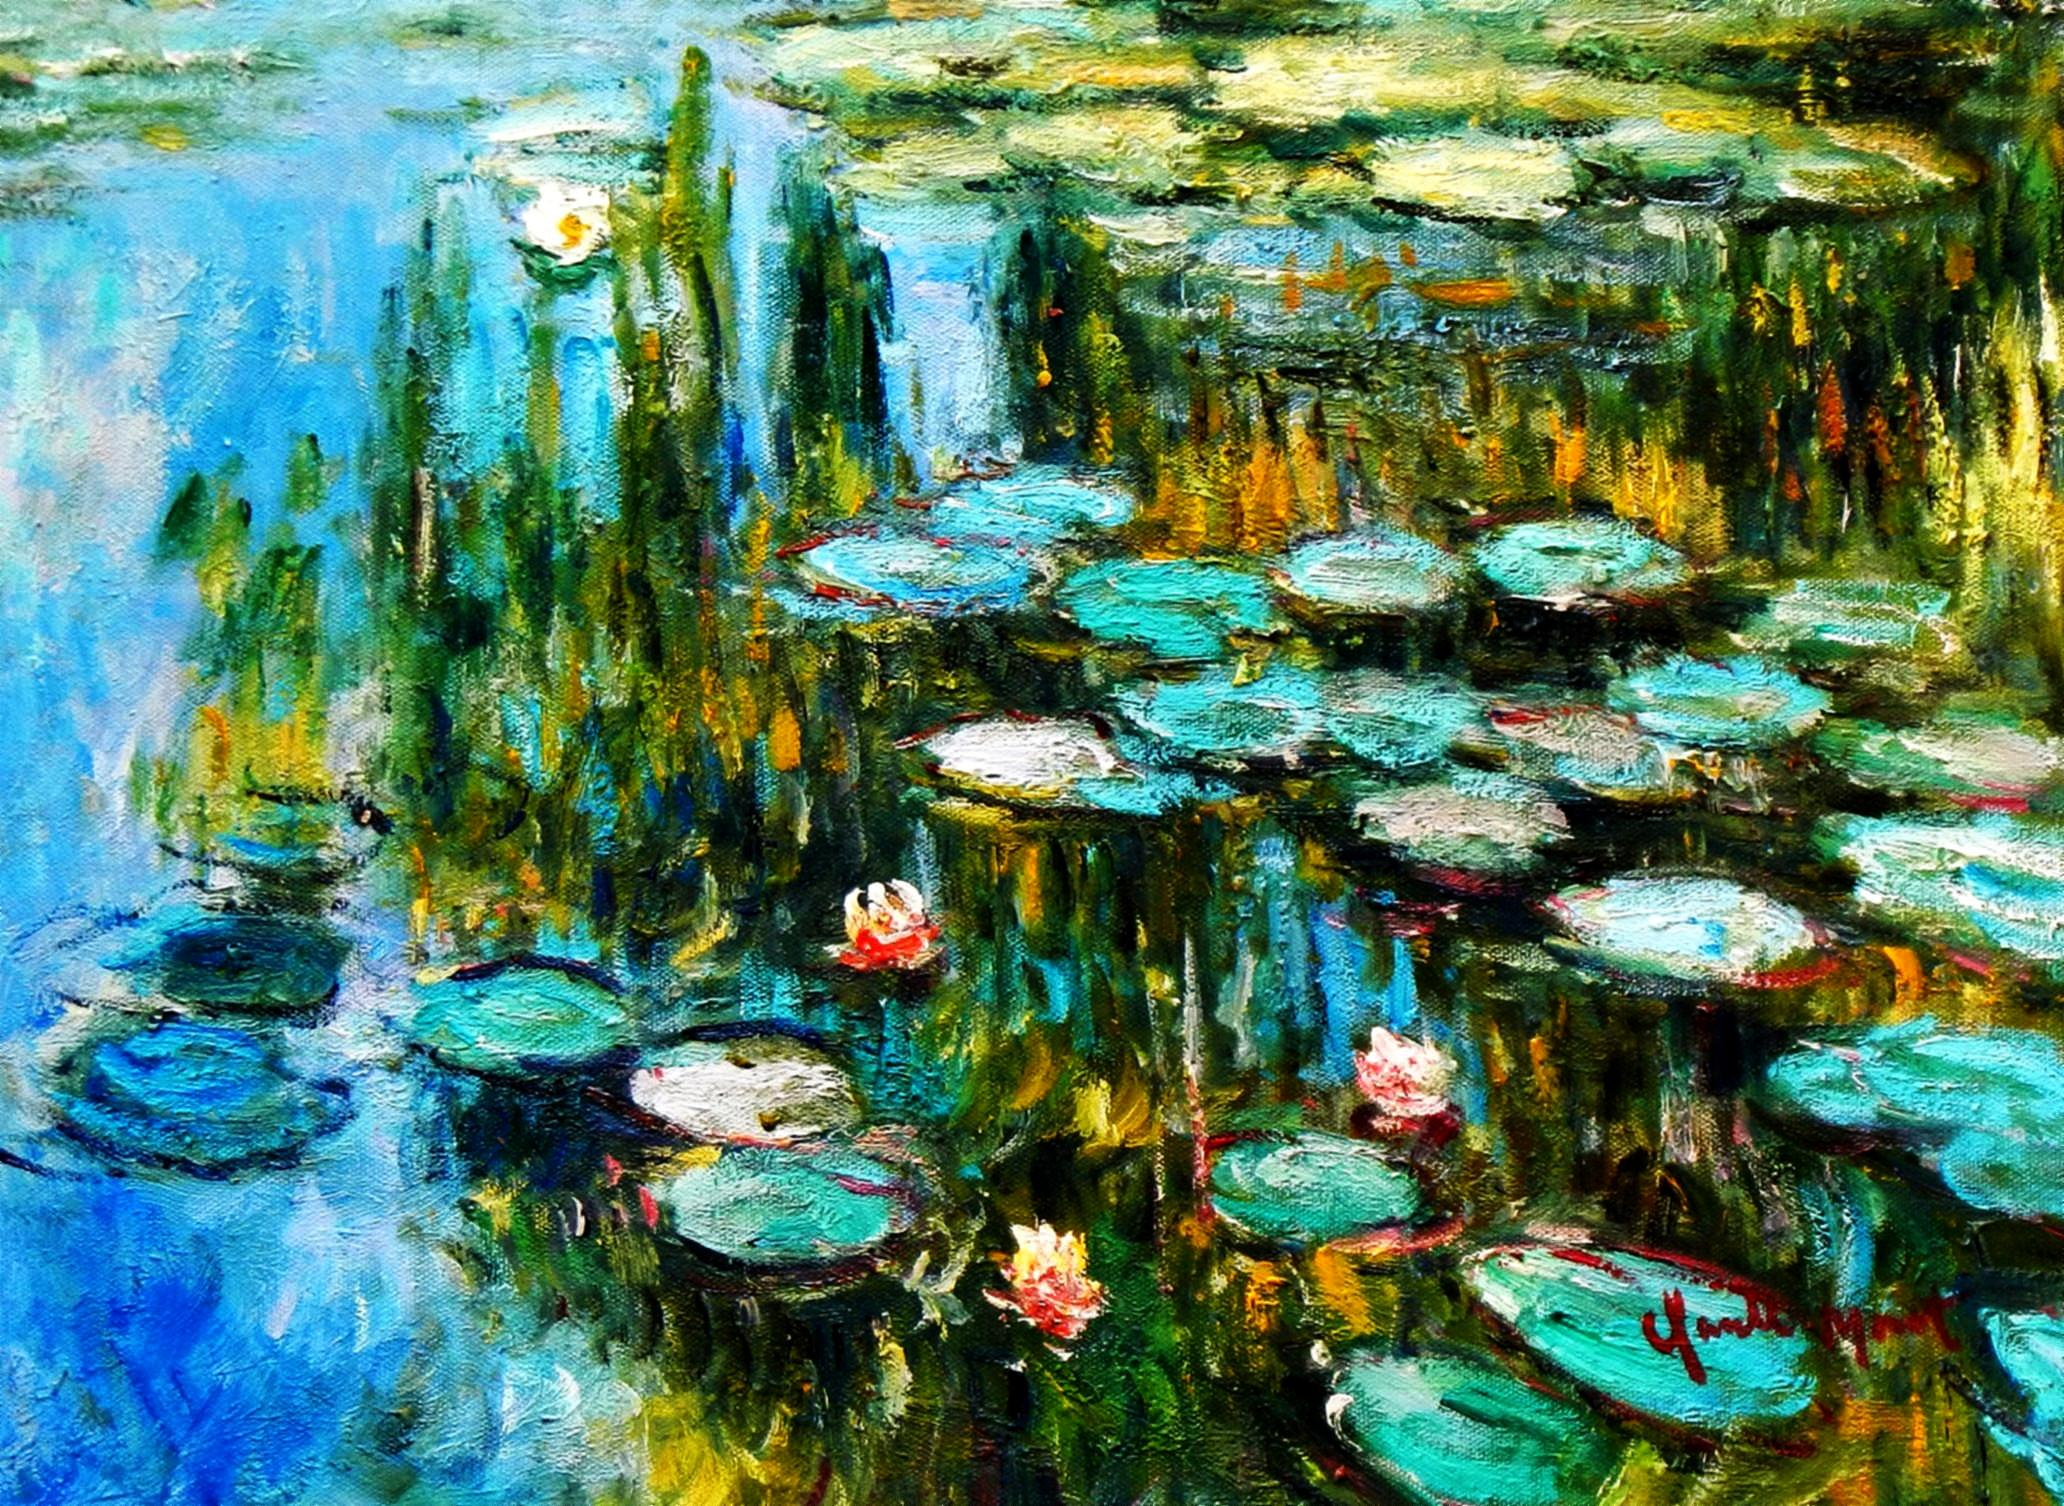 Claude Monet - Seerosen im Frühling a94153 30x40cm Ölgemälde handgemalt